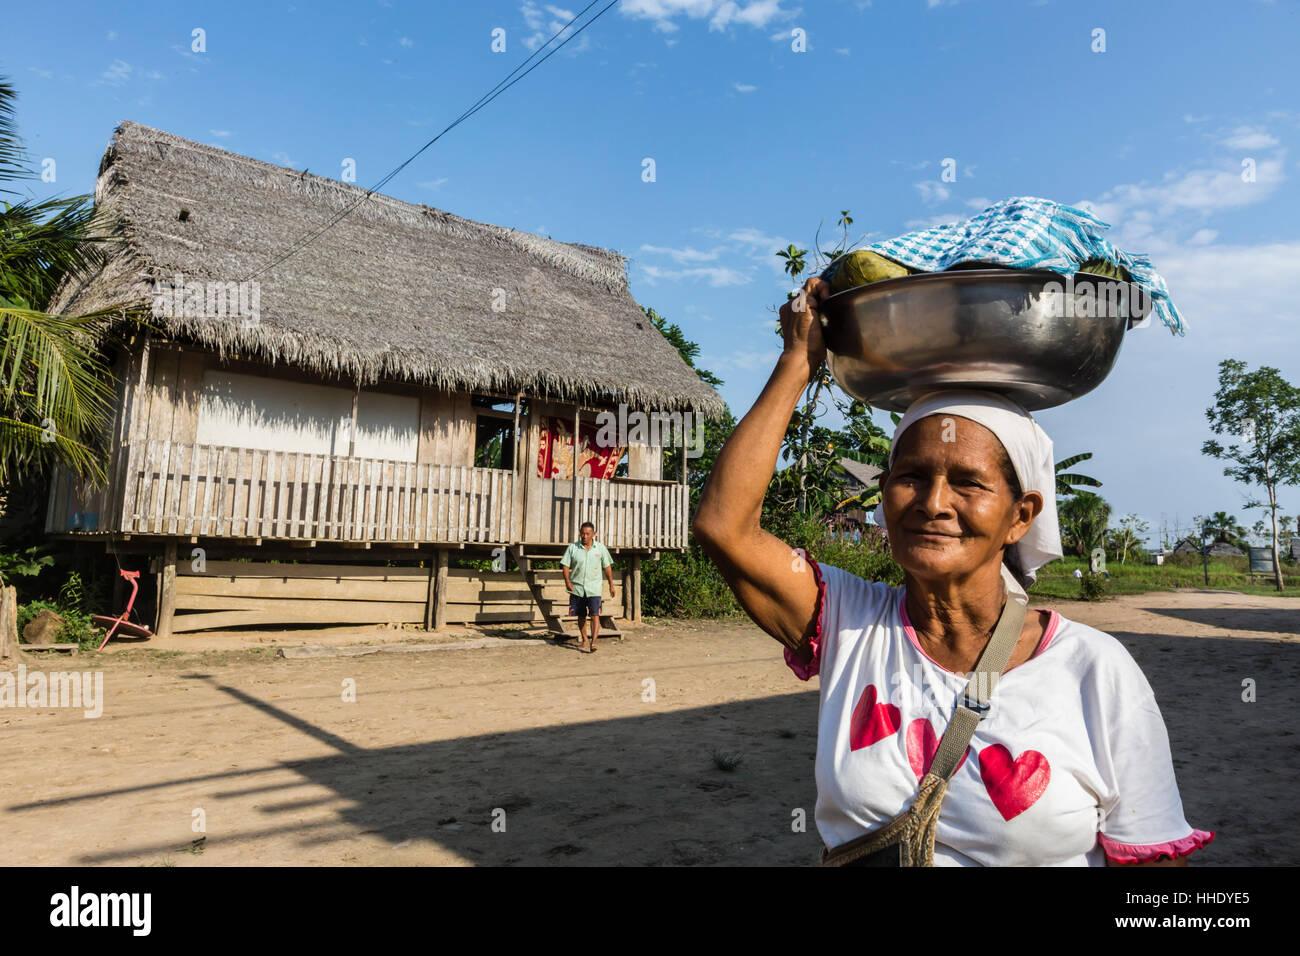 Woman carrying food in bowl, San Miguel Caño, Upper Amazon River Basin, Loreto, Peru - Stock Image